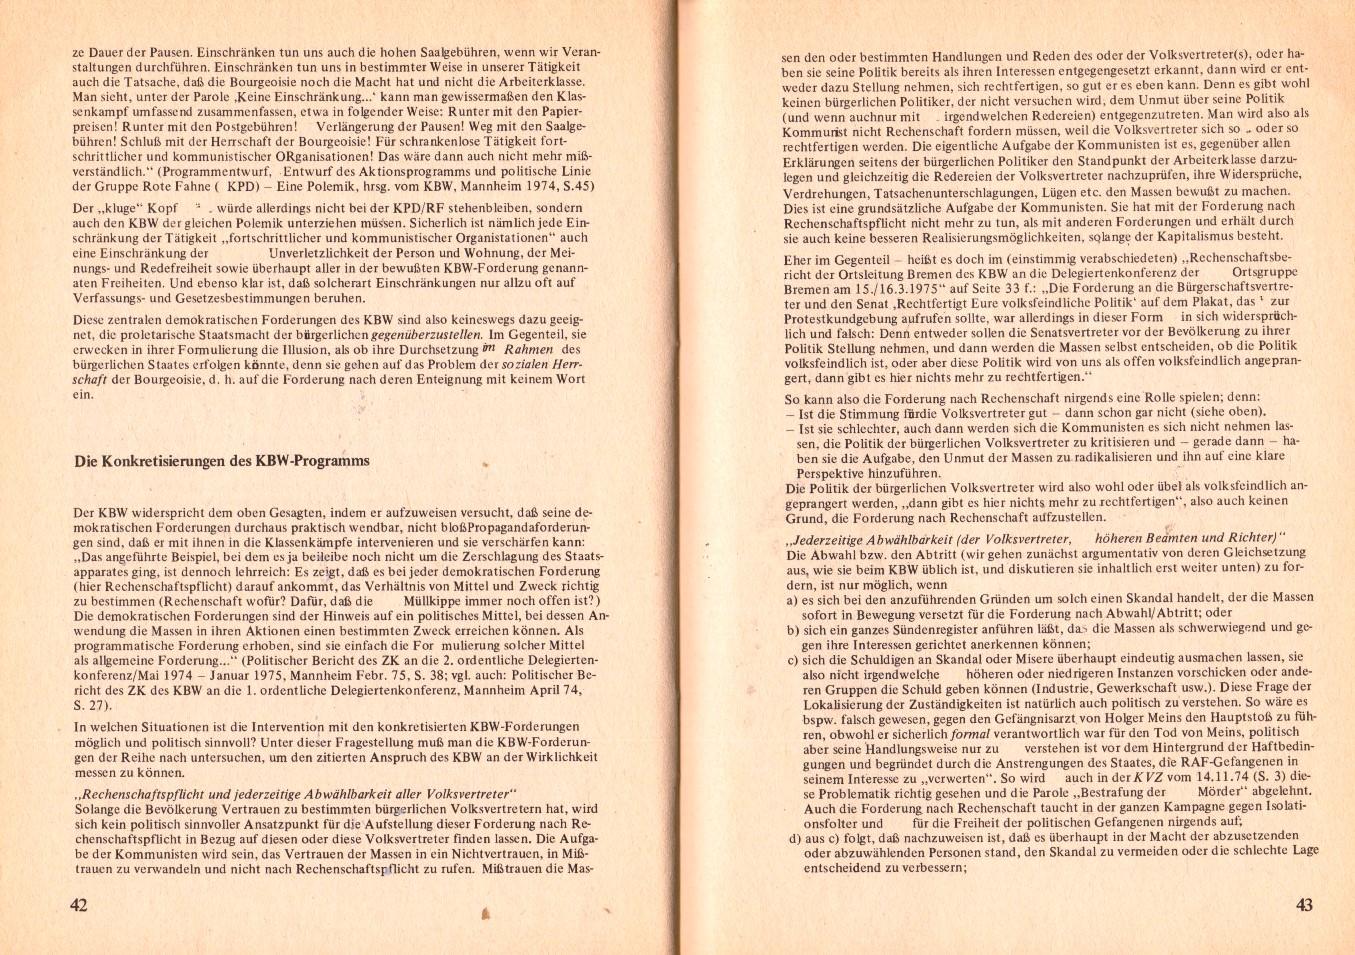 Spartacus_1975_Kritik_des_KBW_23